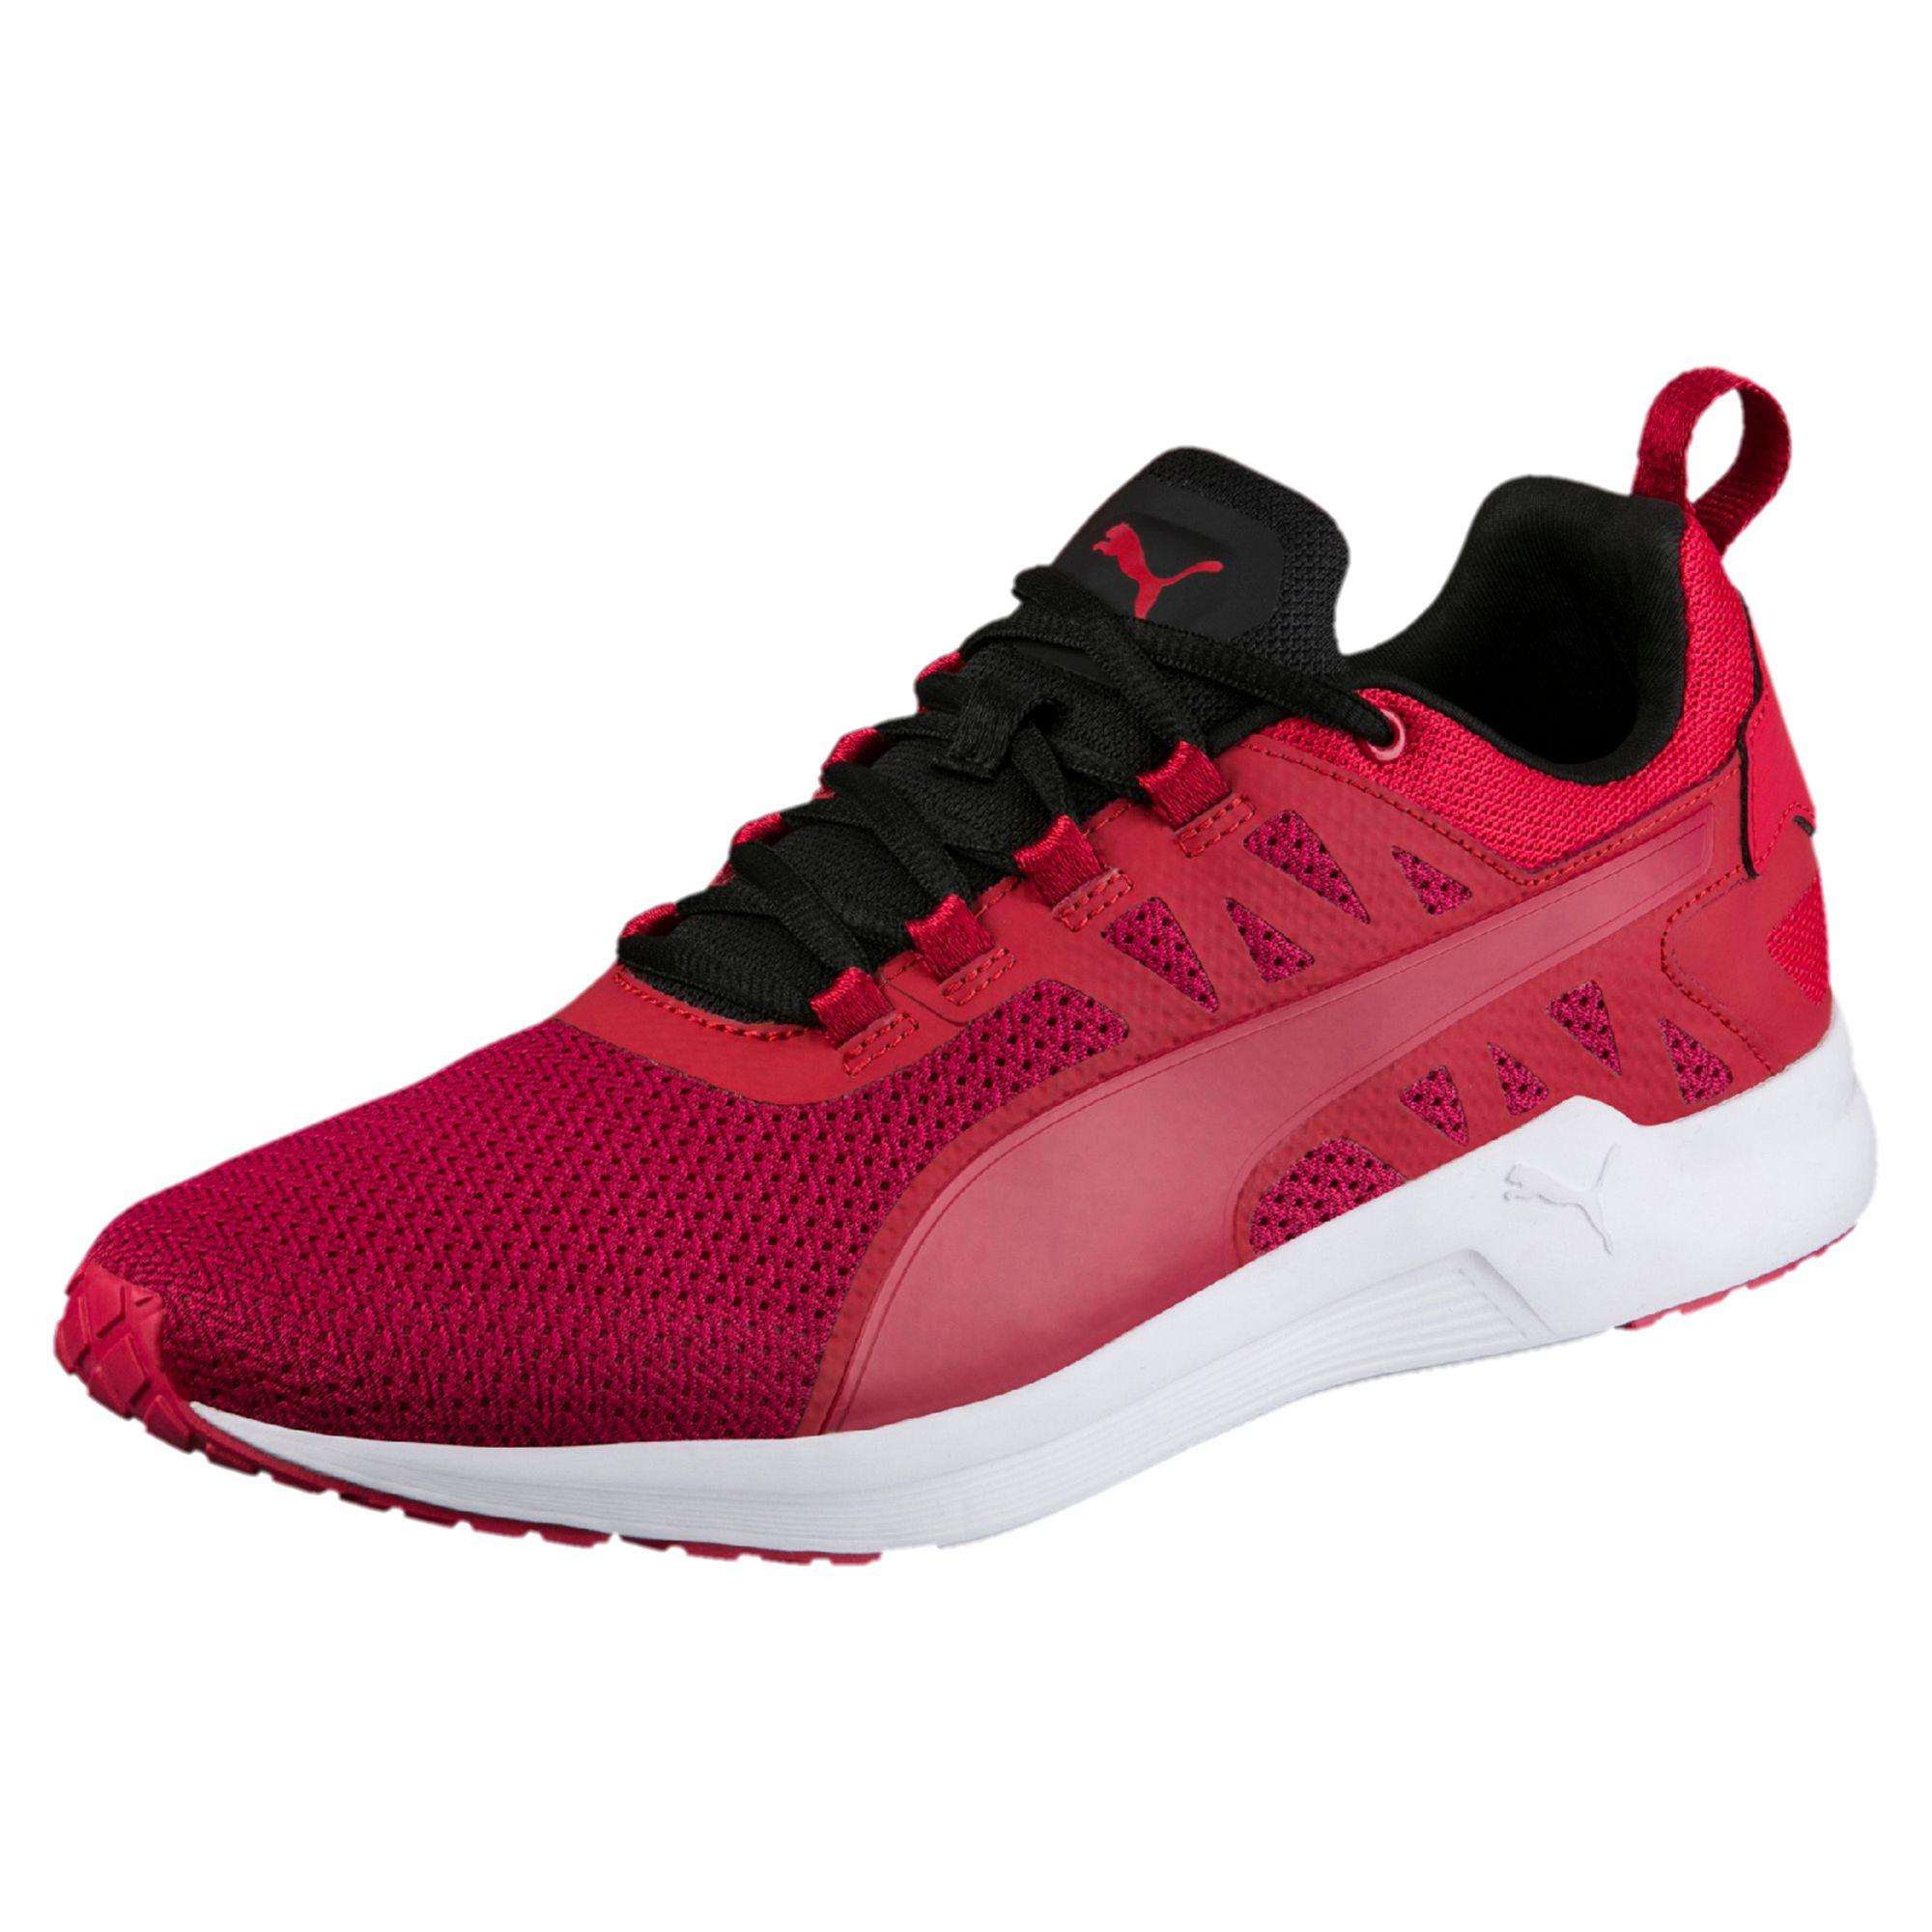 Pulse XT Core v2 мужские кроссовки